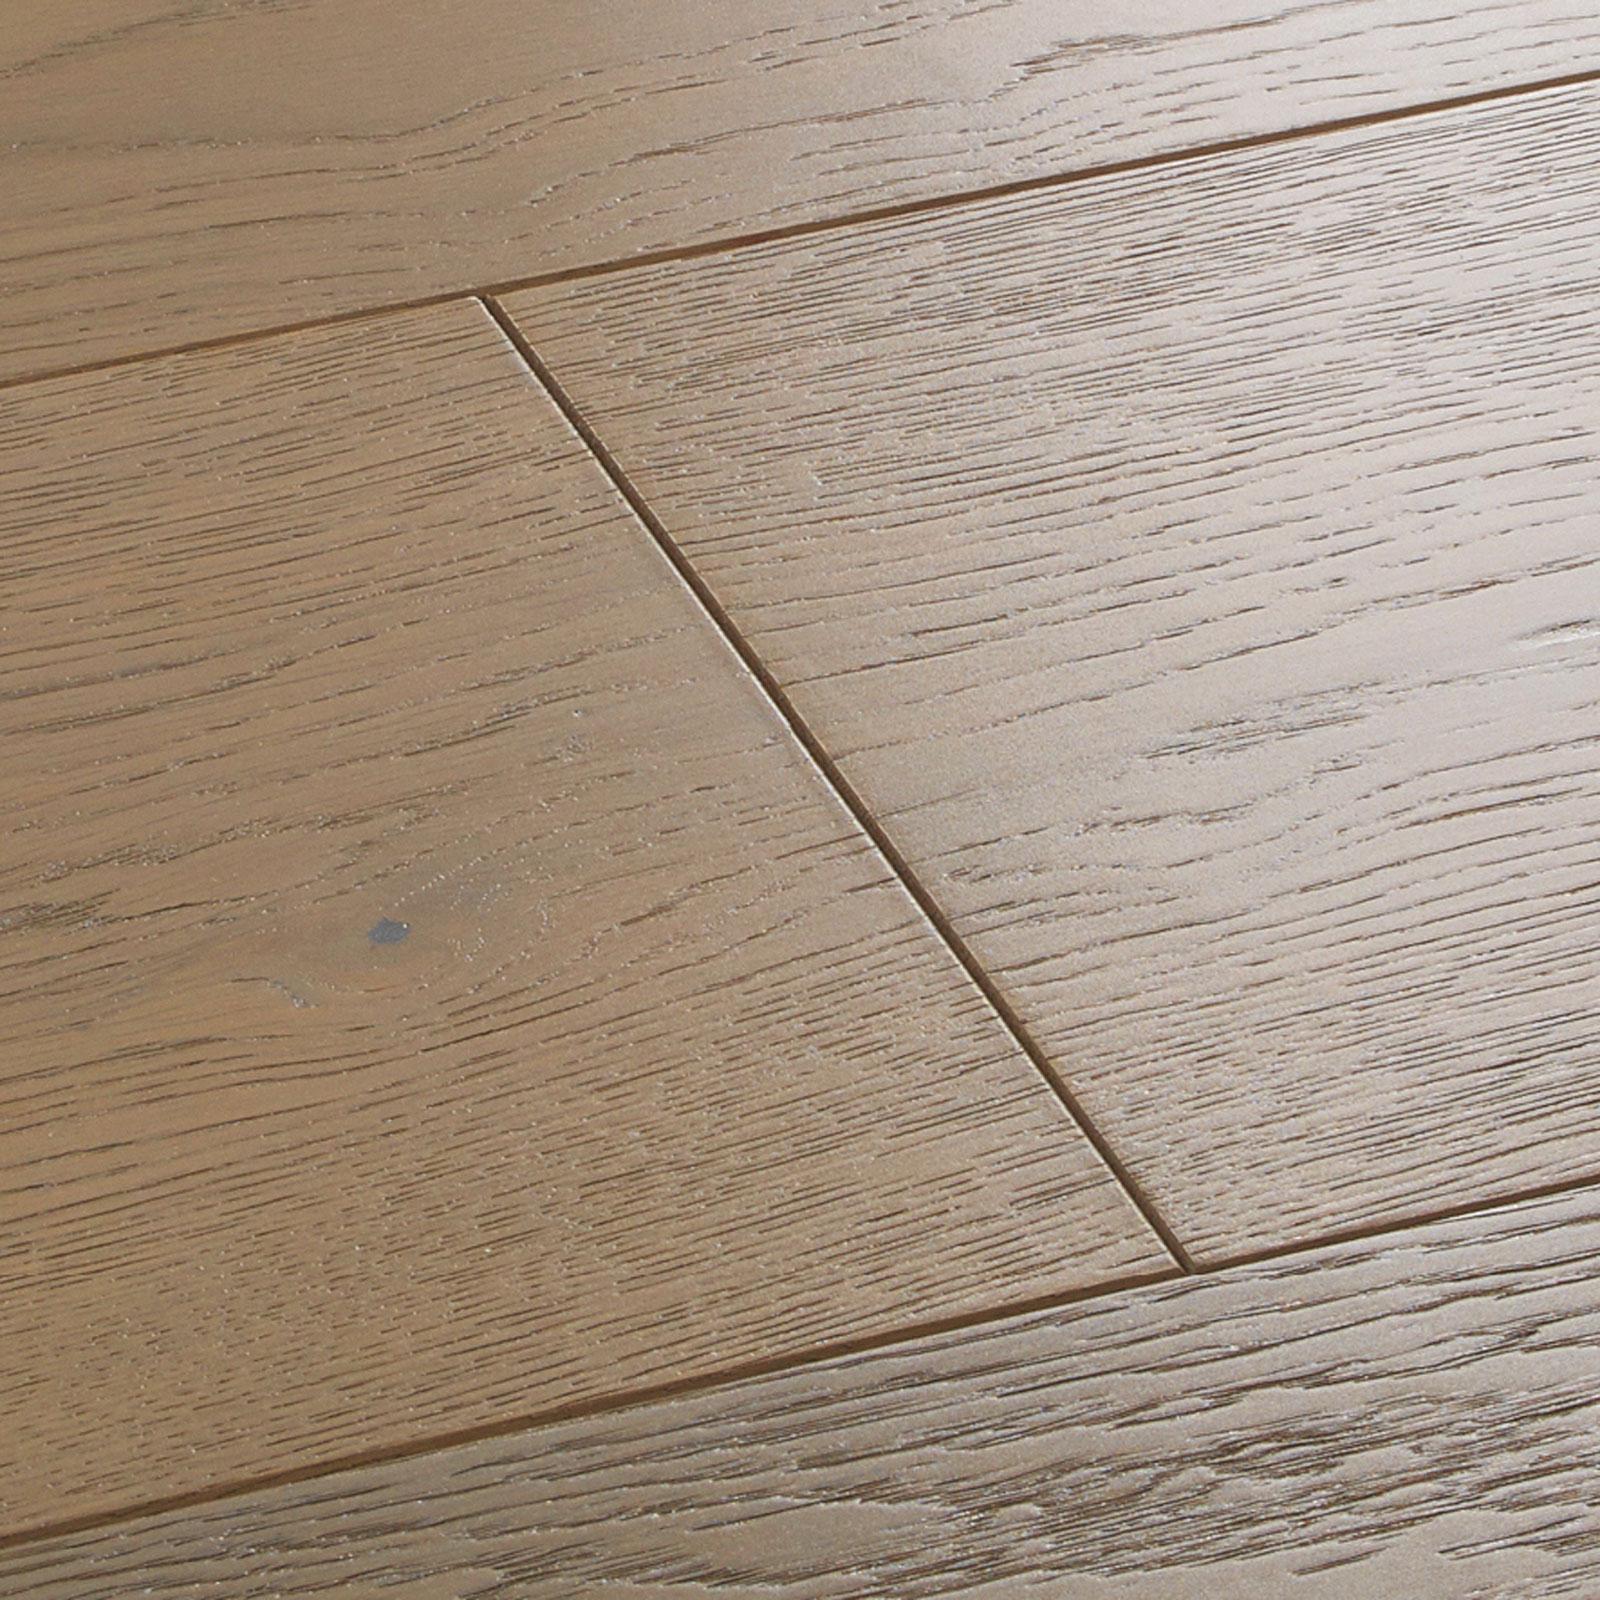 swatch-cropped-salcombe-dune-oak-1600